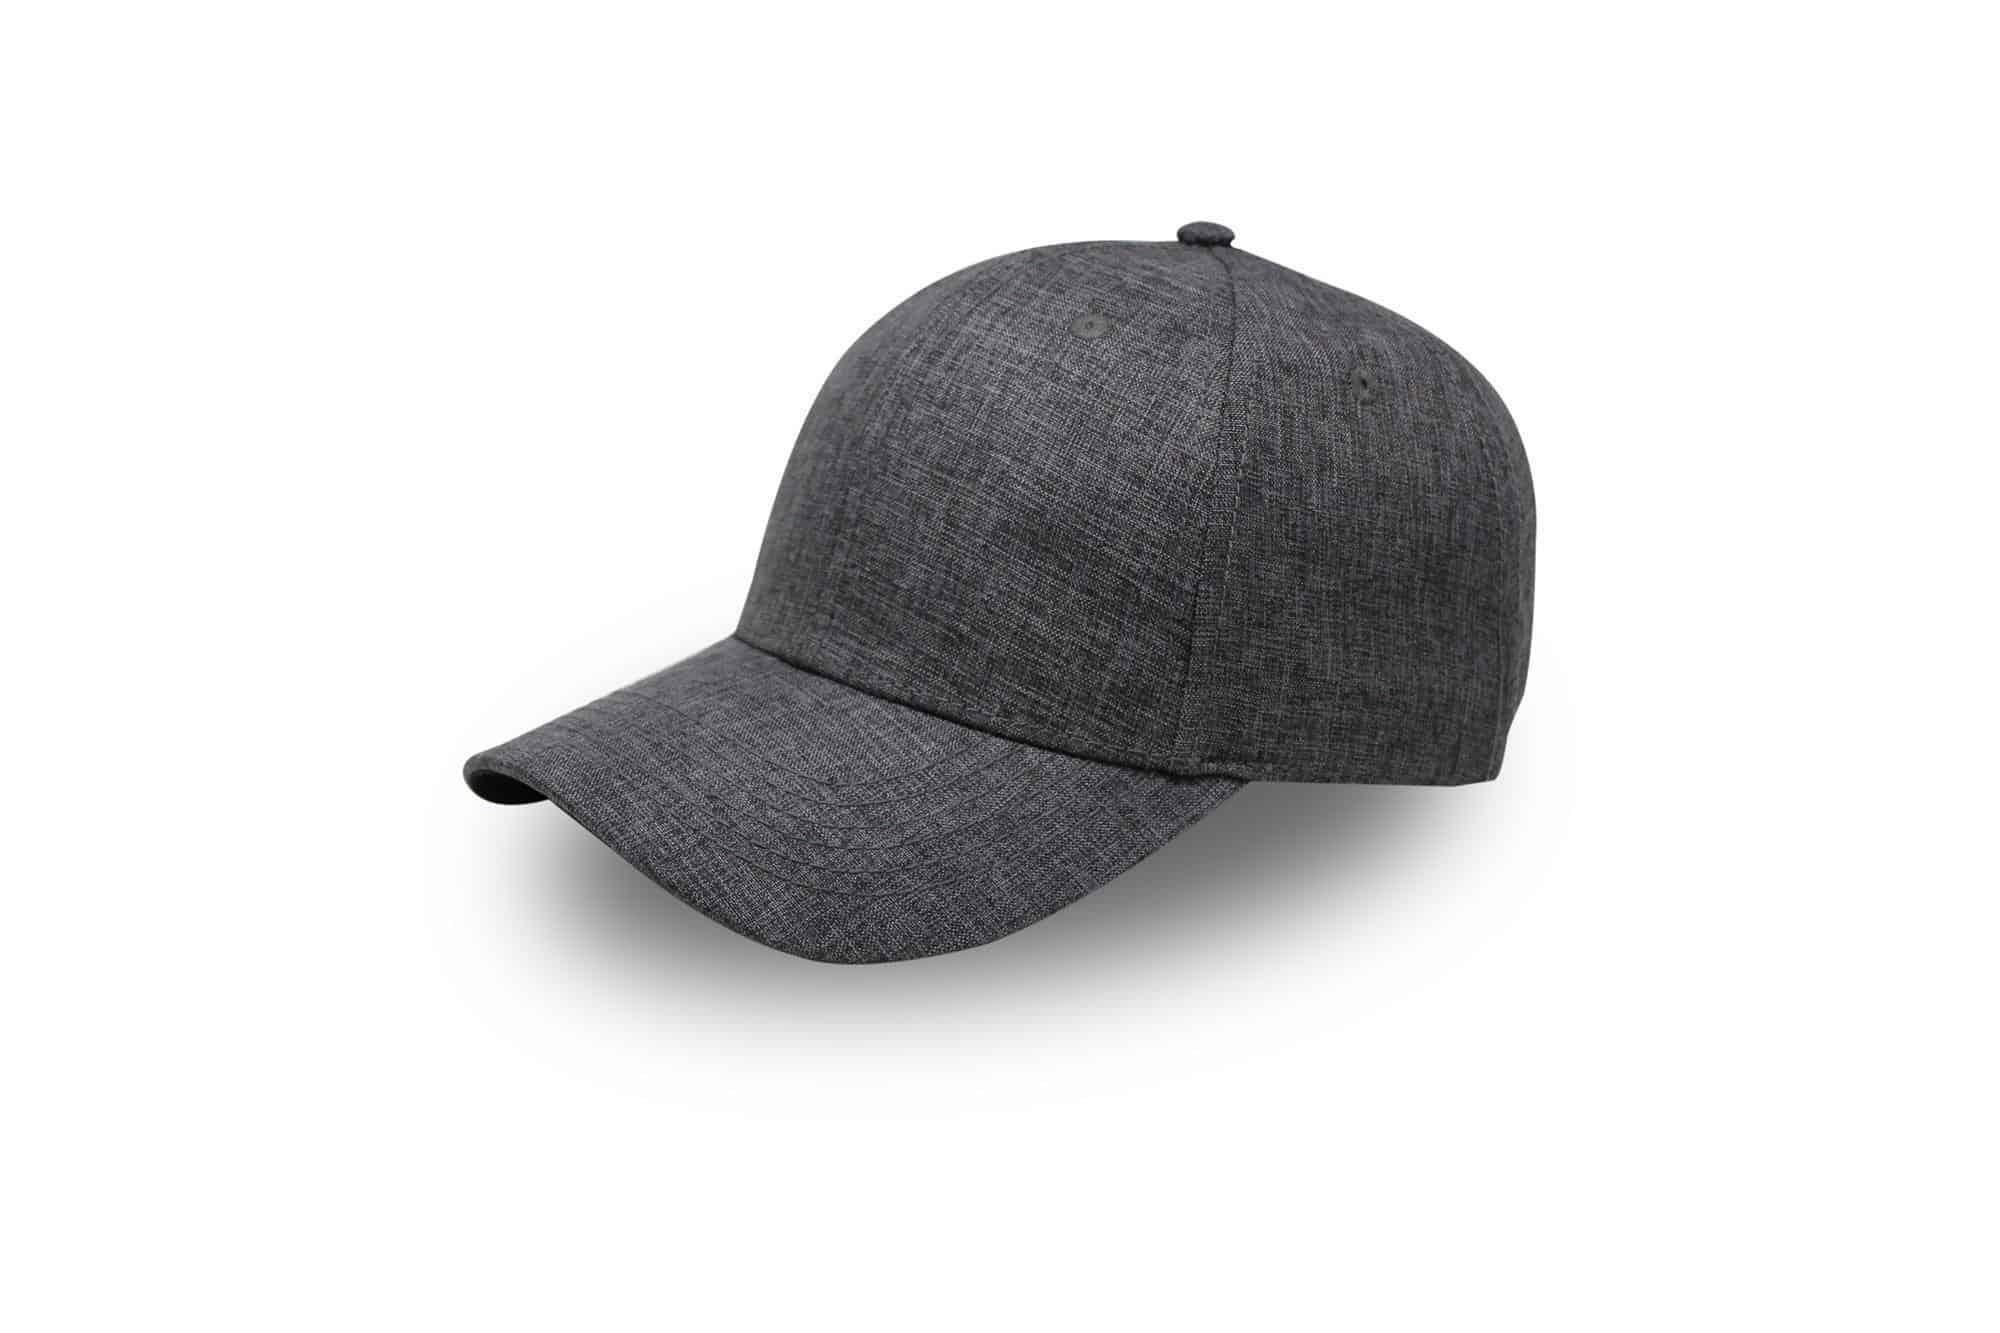 S19601 Summit Headwear and Accessories